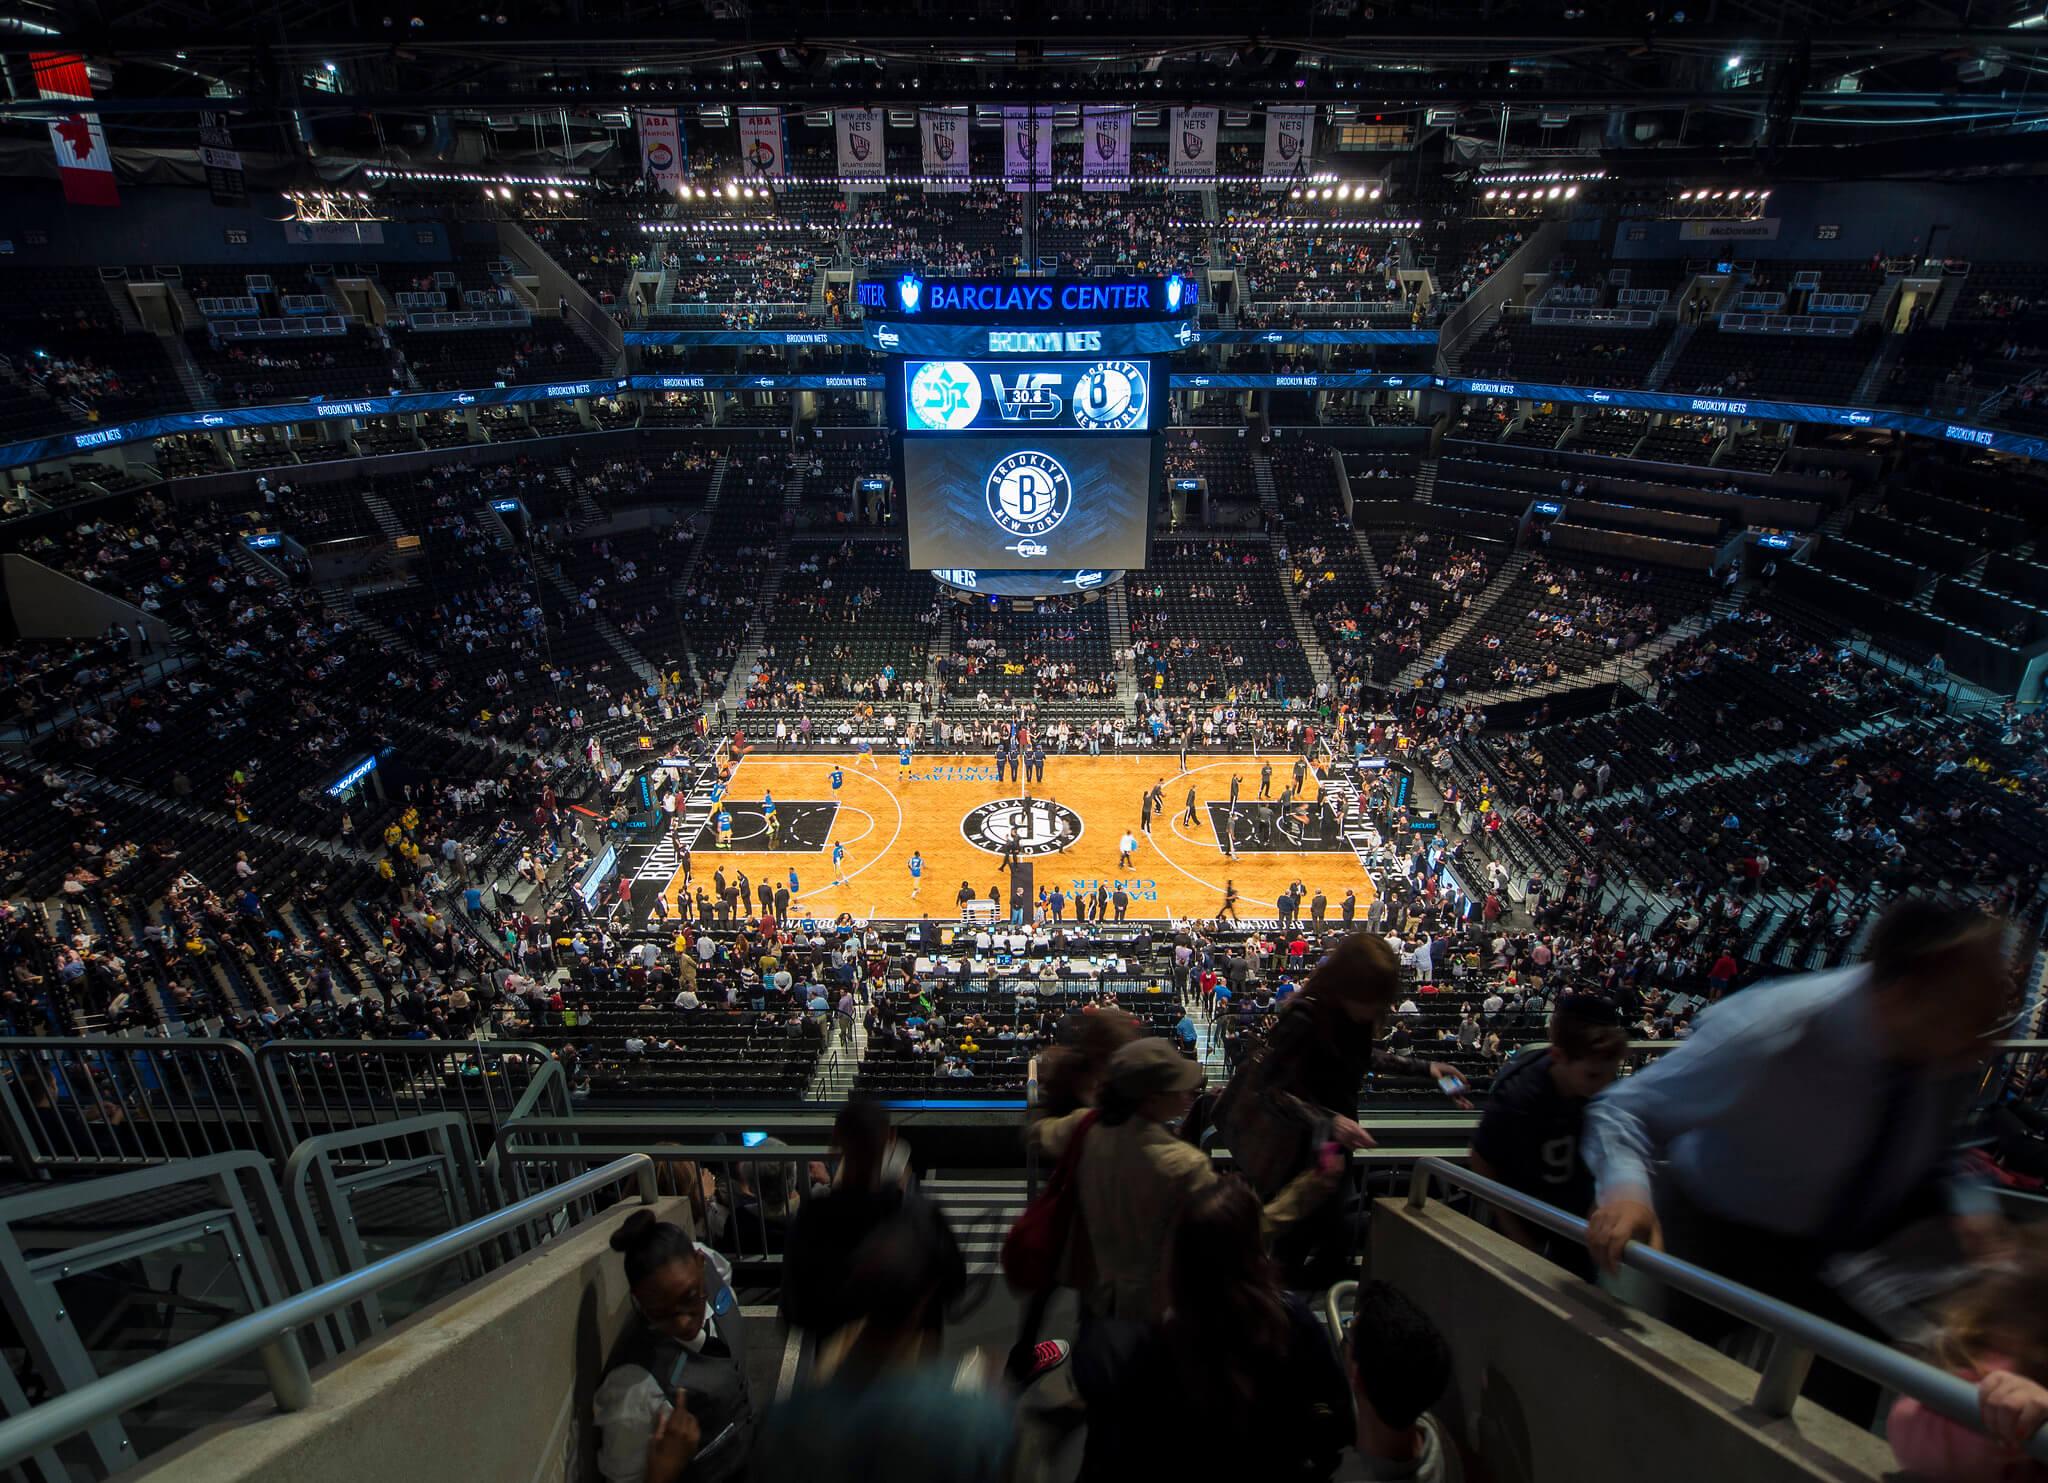 Barclays Center basketball stadium